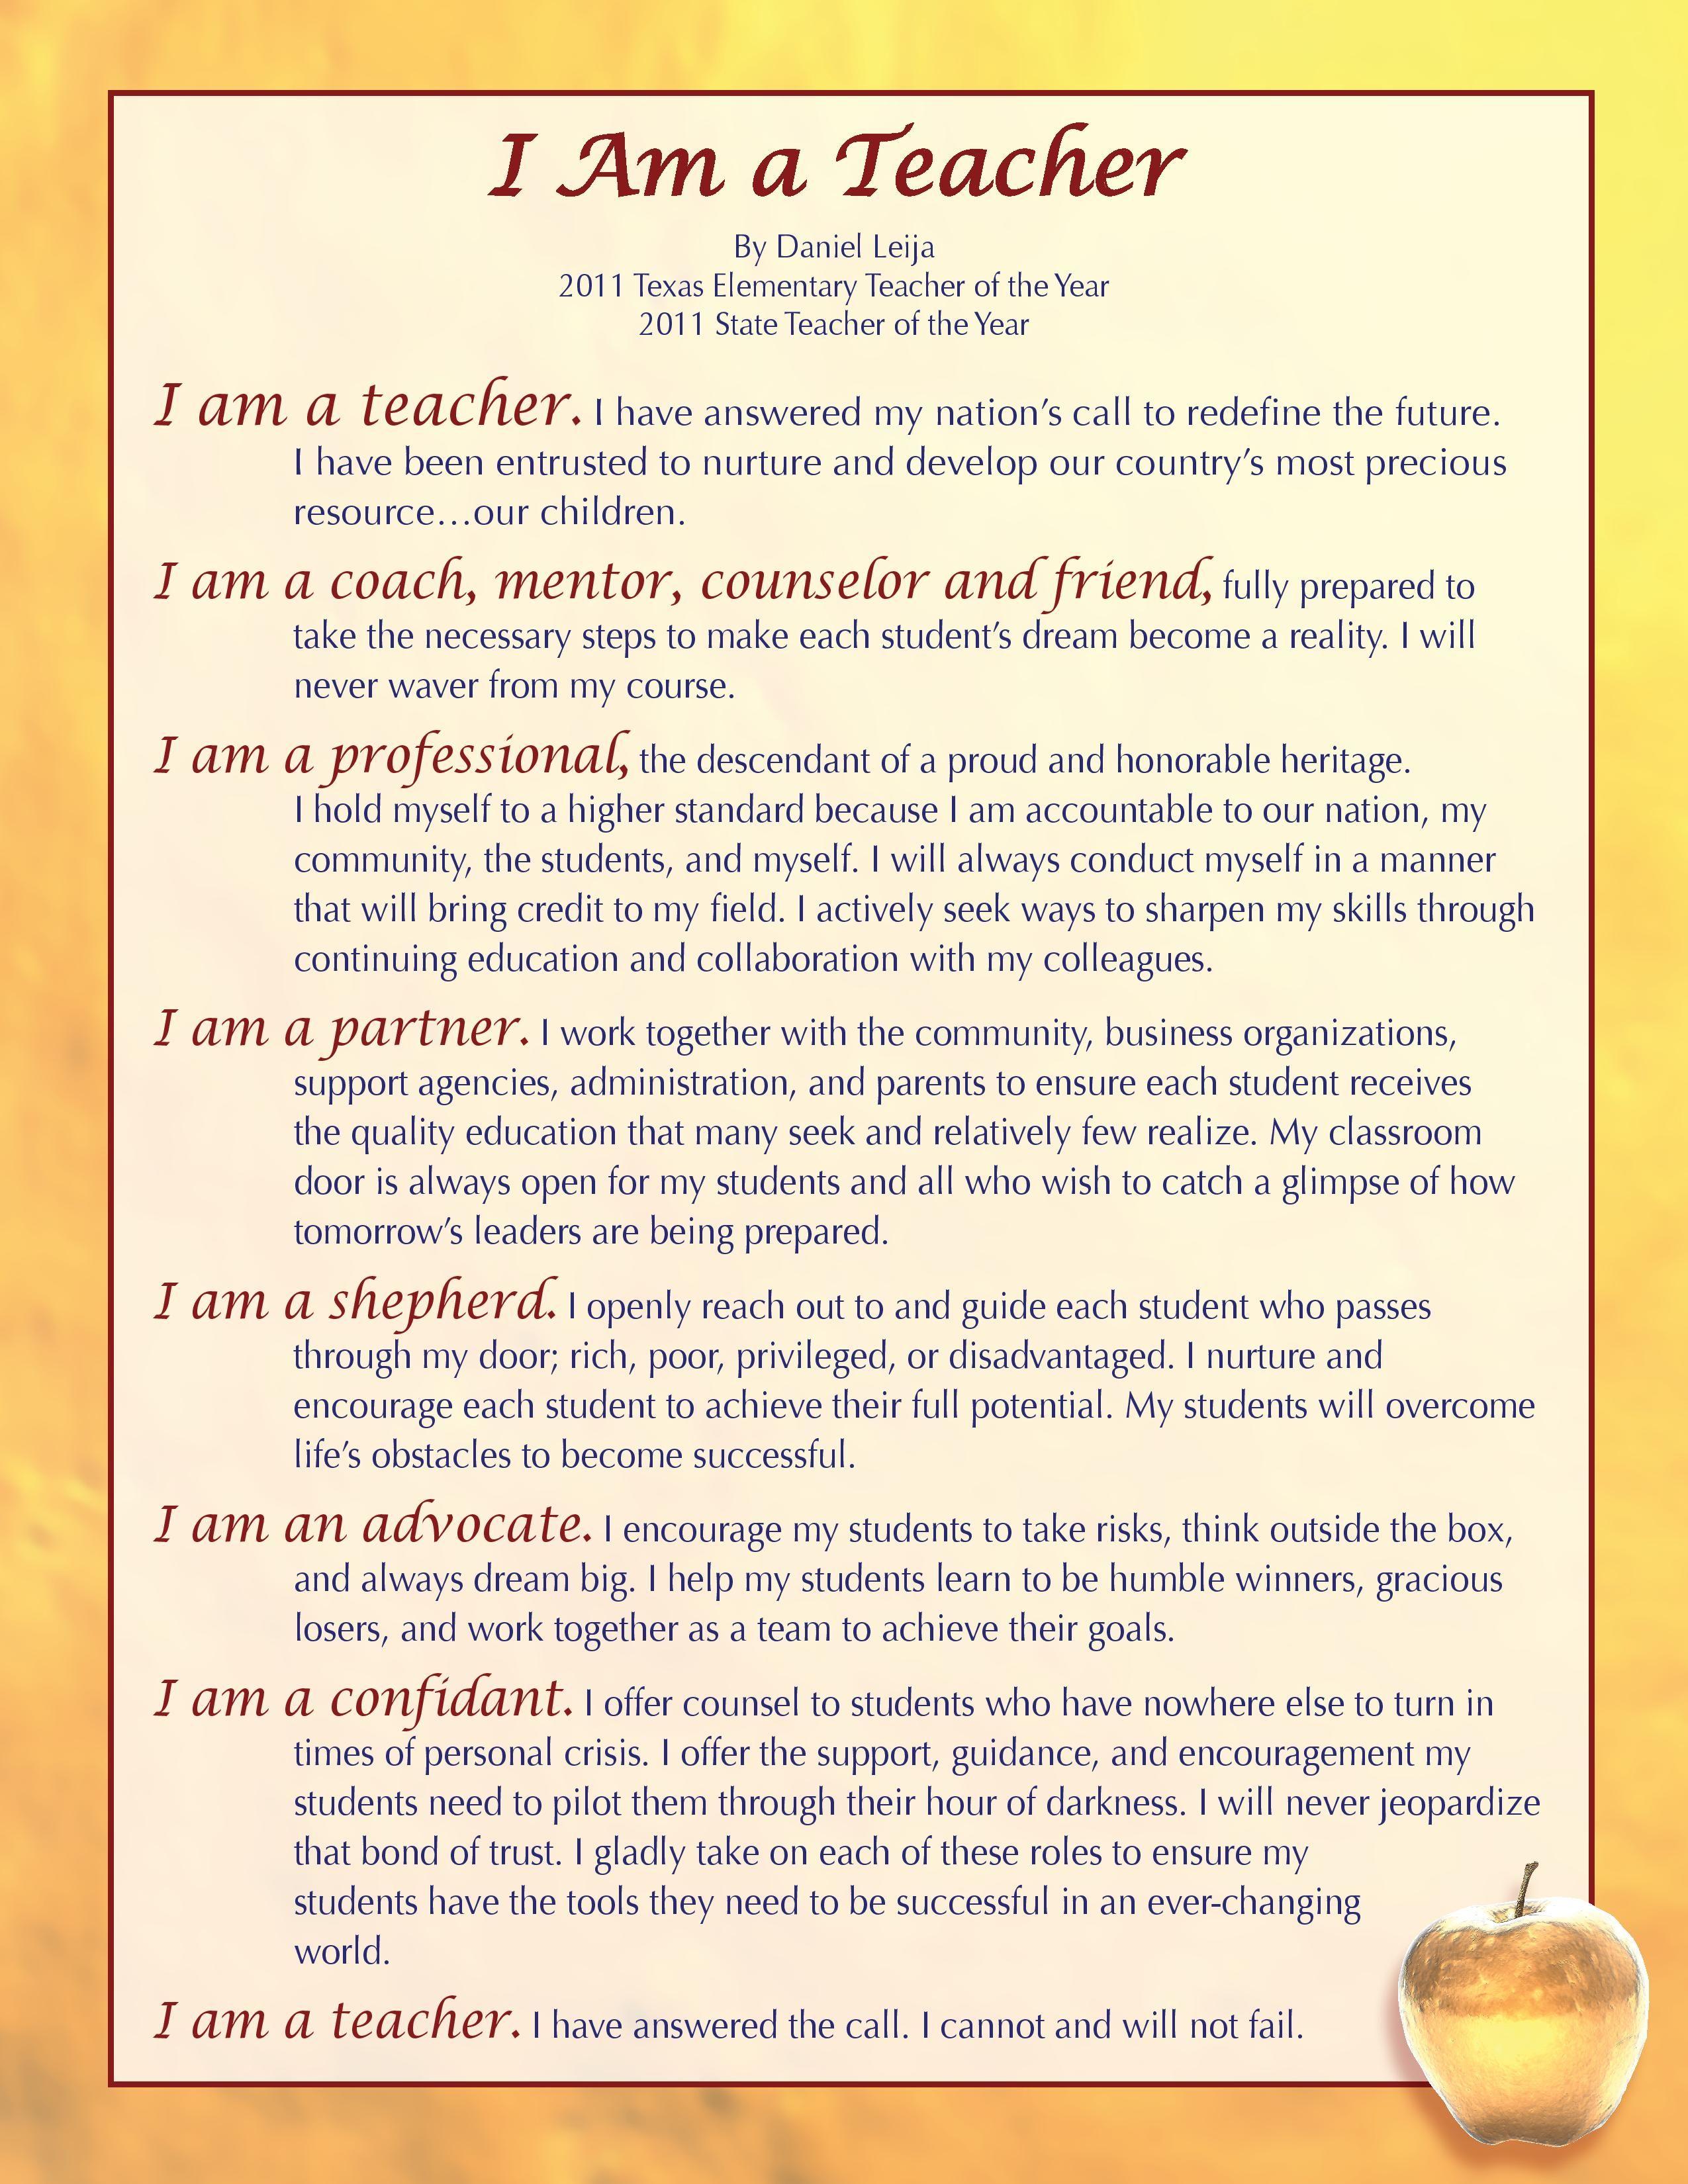 descriptive essay about a teacher essay on teaching and learning  on teacher descriptive essay my favorite teacher scholar advisor